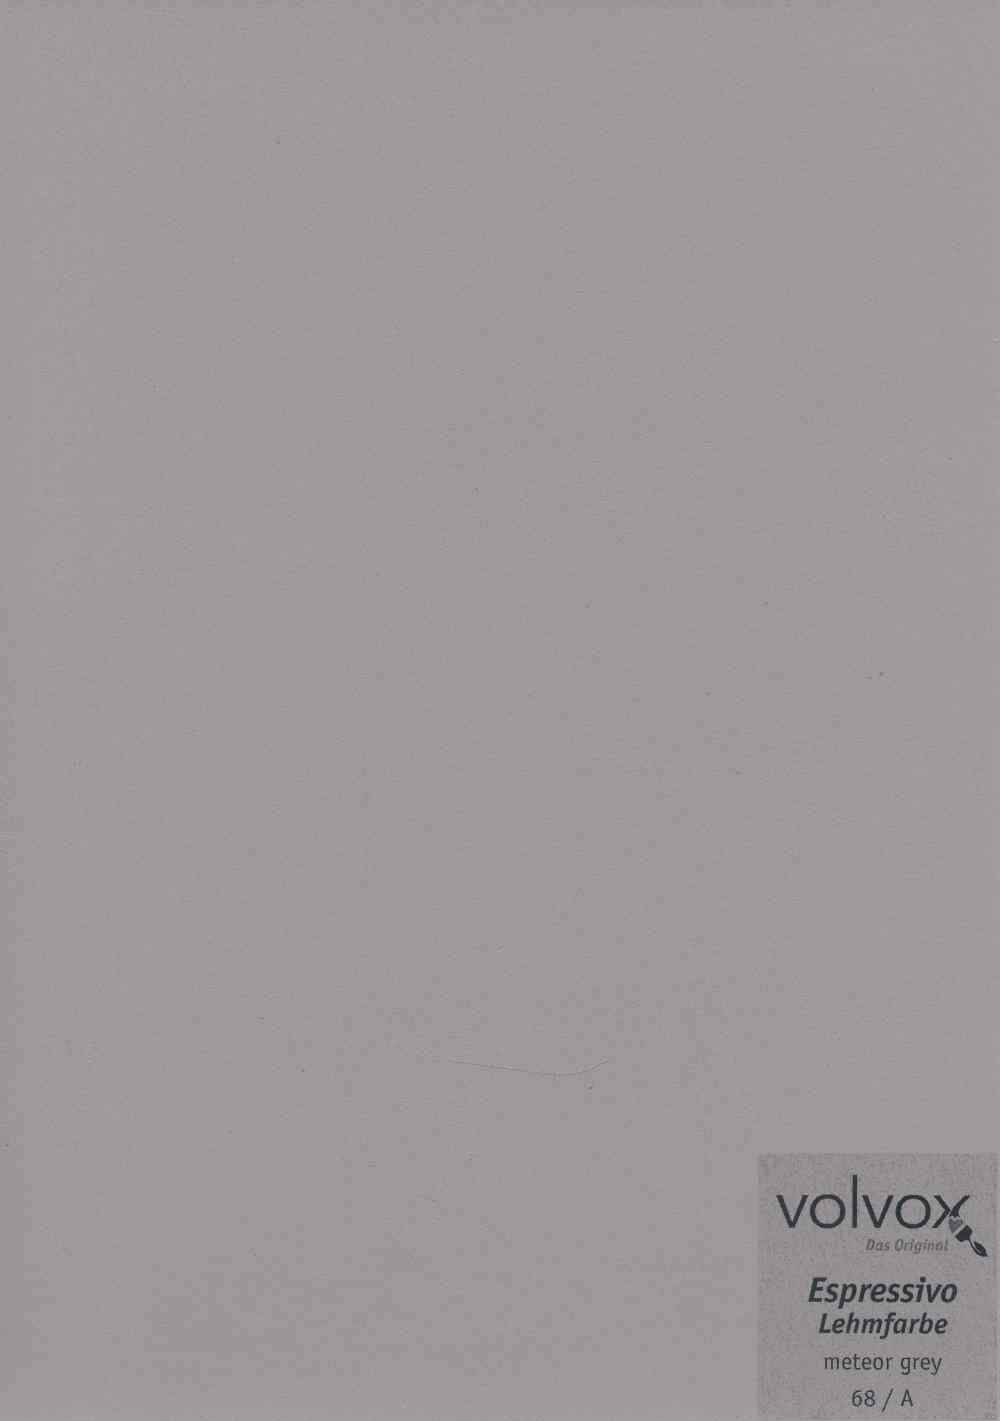 Volvox Espressivo Lehmfarbe 068 meteor grey